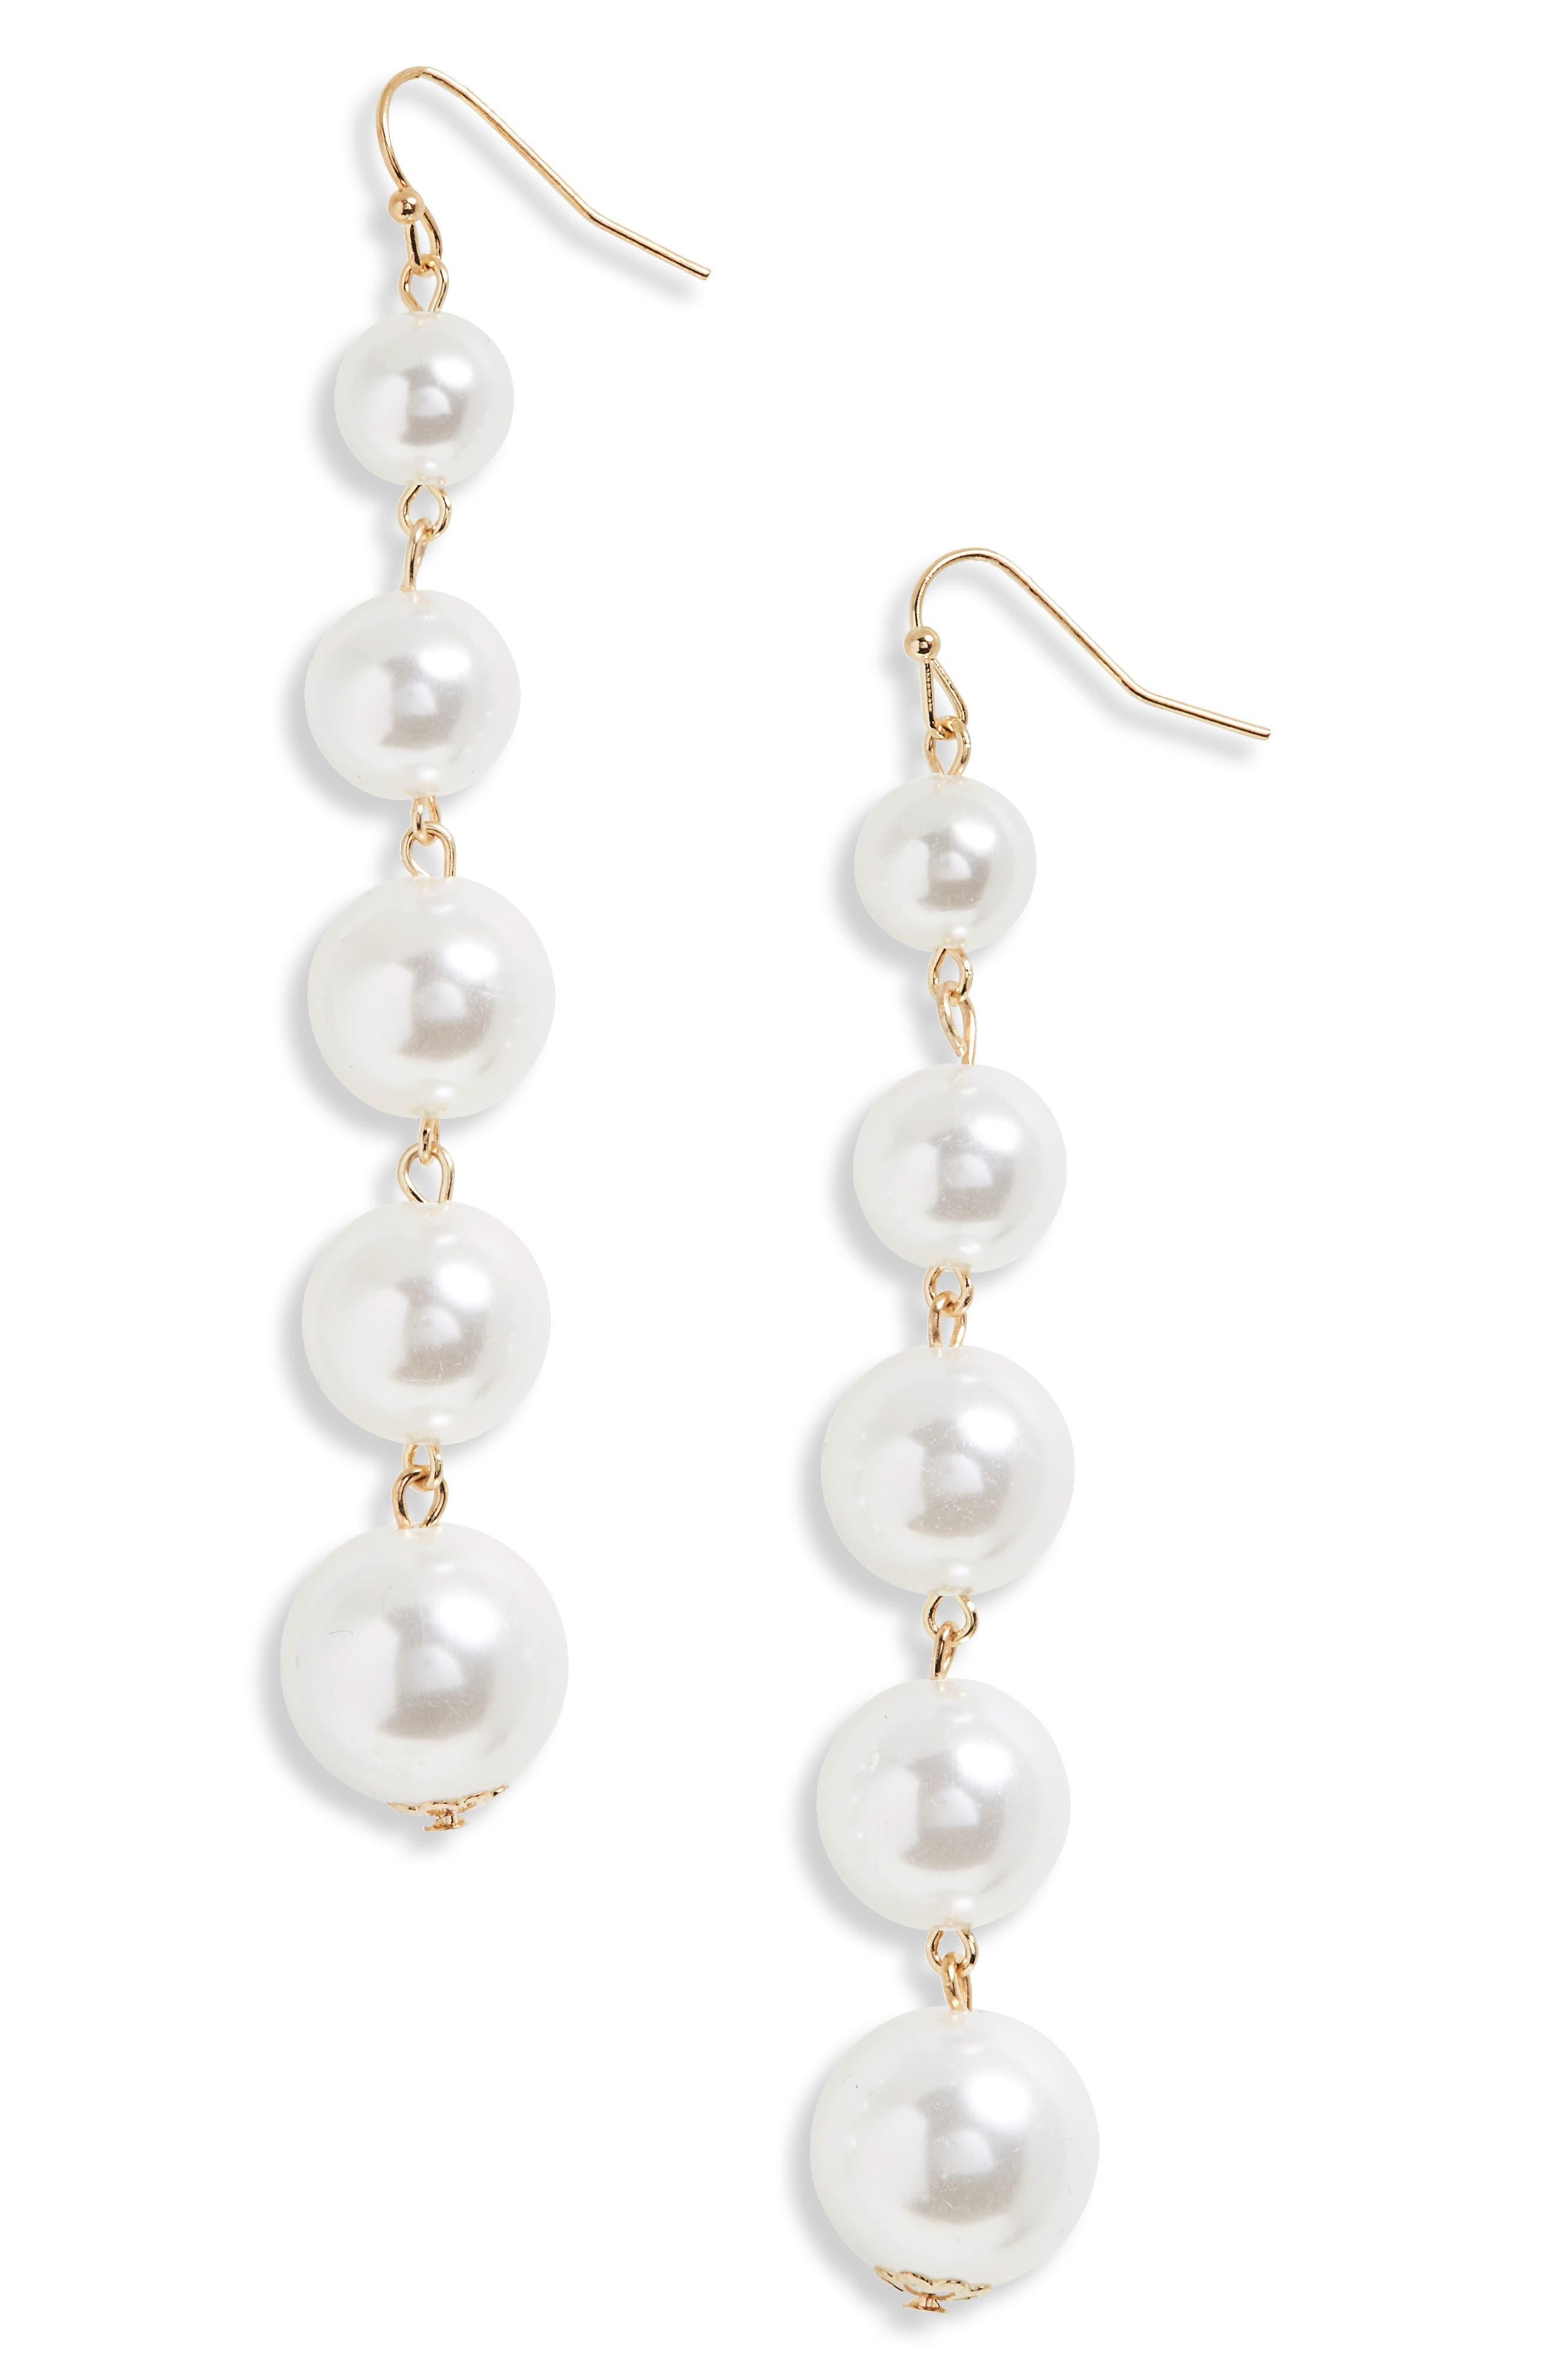 Main Image - Girly Faux Pearl Drop Earrings